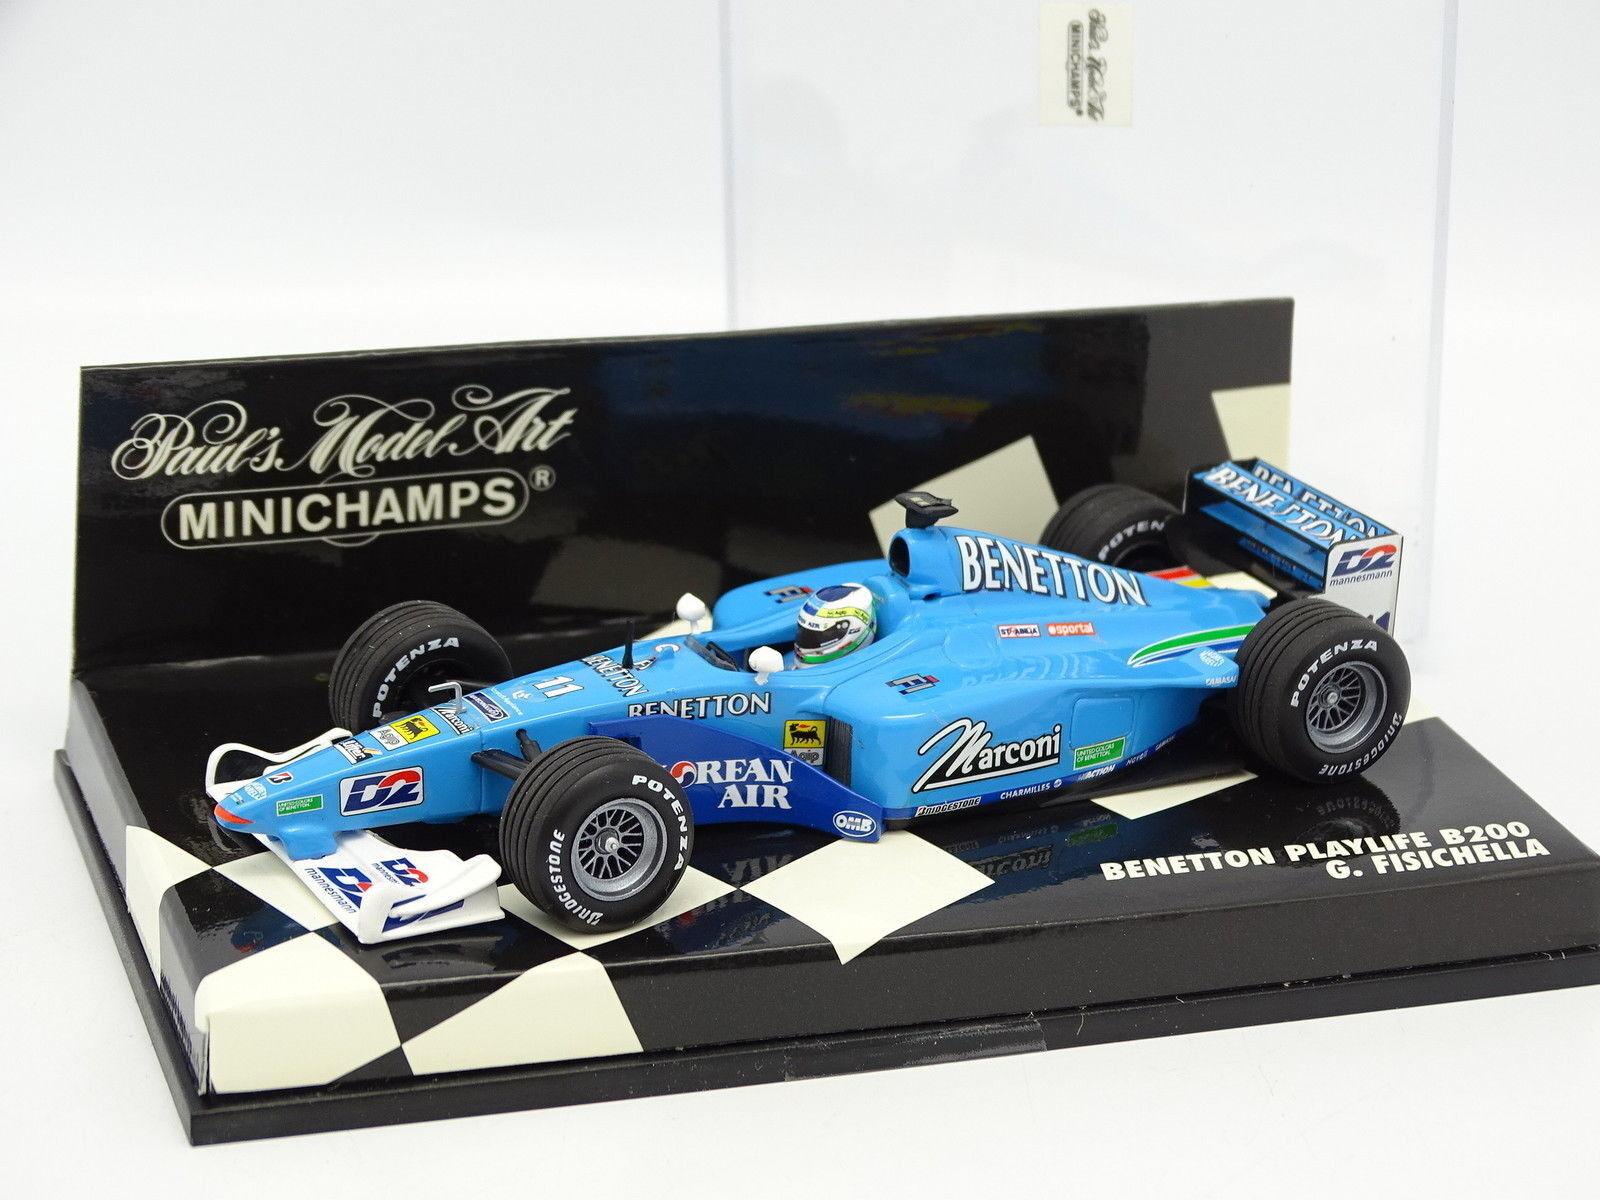 Minichamps 1 43 43 43 - F1 Benetton Playlife B200 Fisichella 0b0392